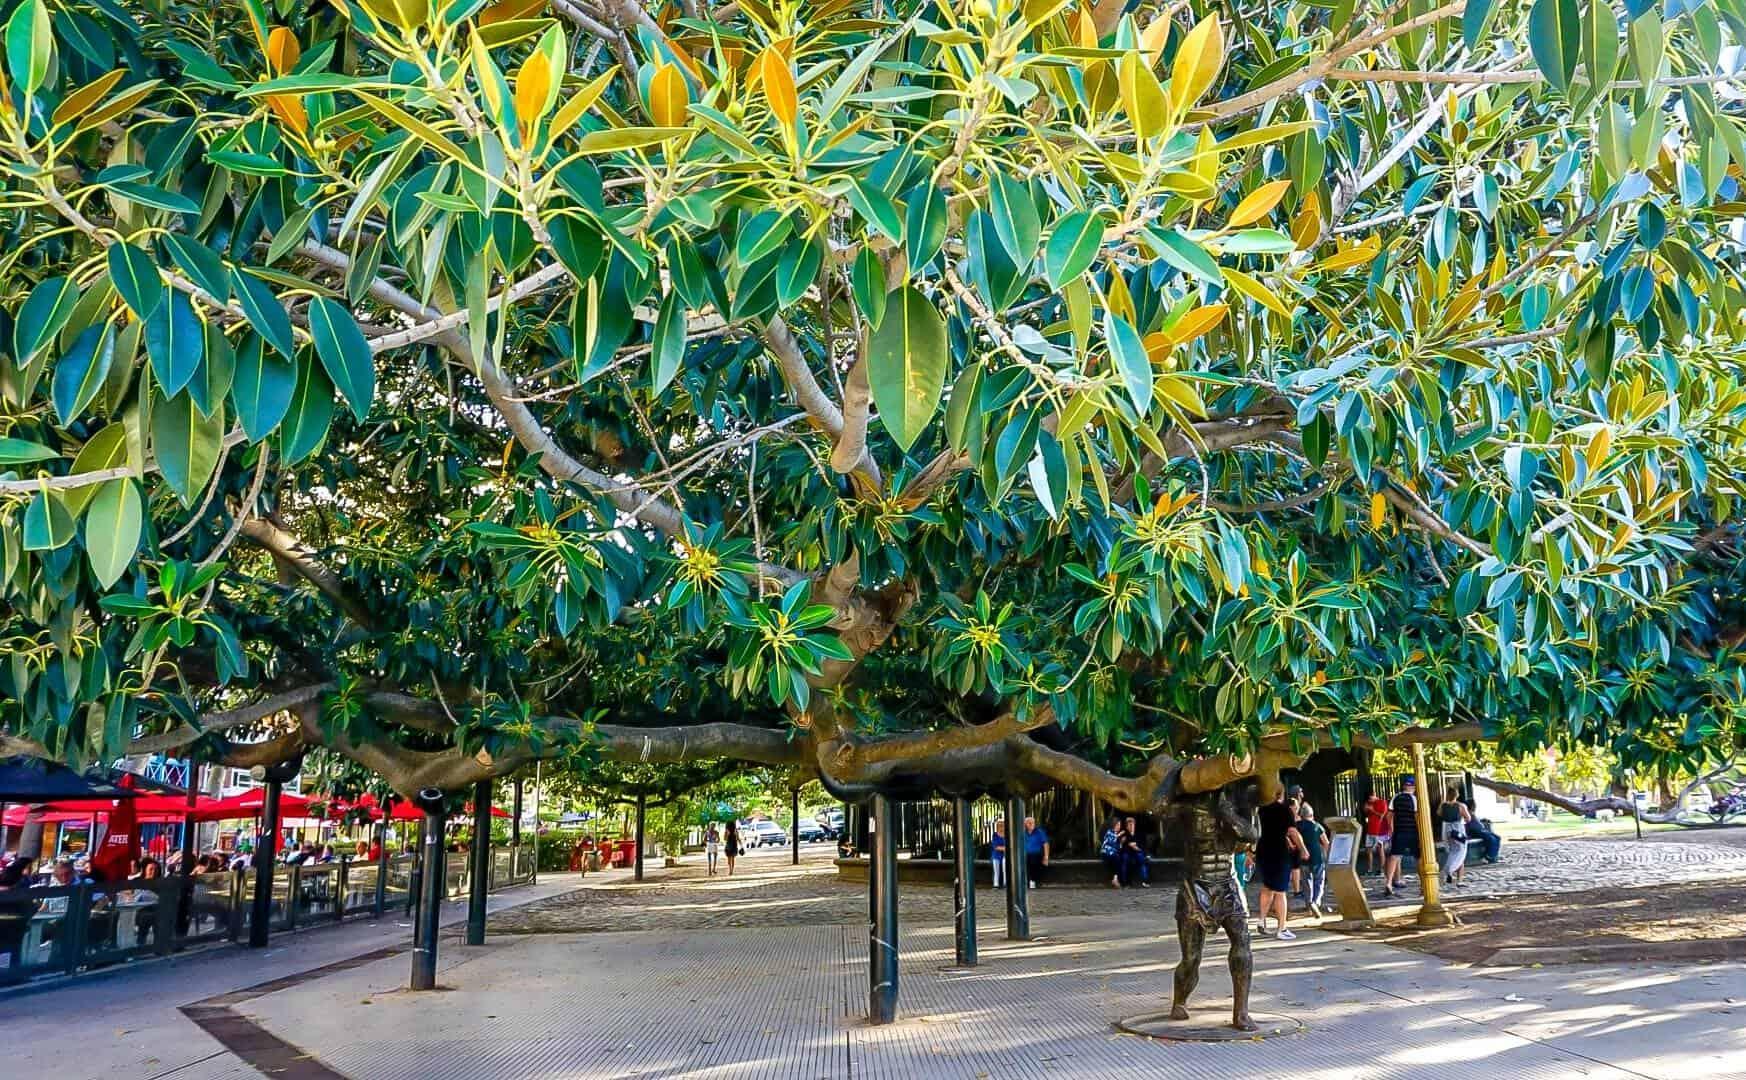 A giant 200 year old tree located in Gomero de la Recoleta